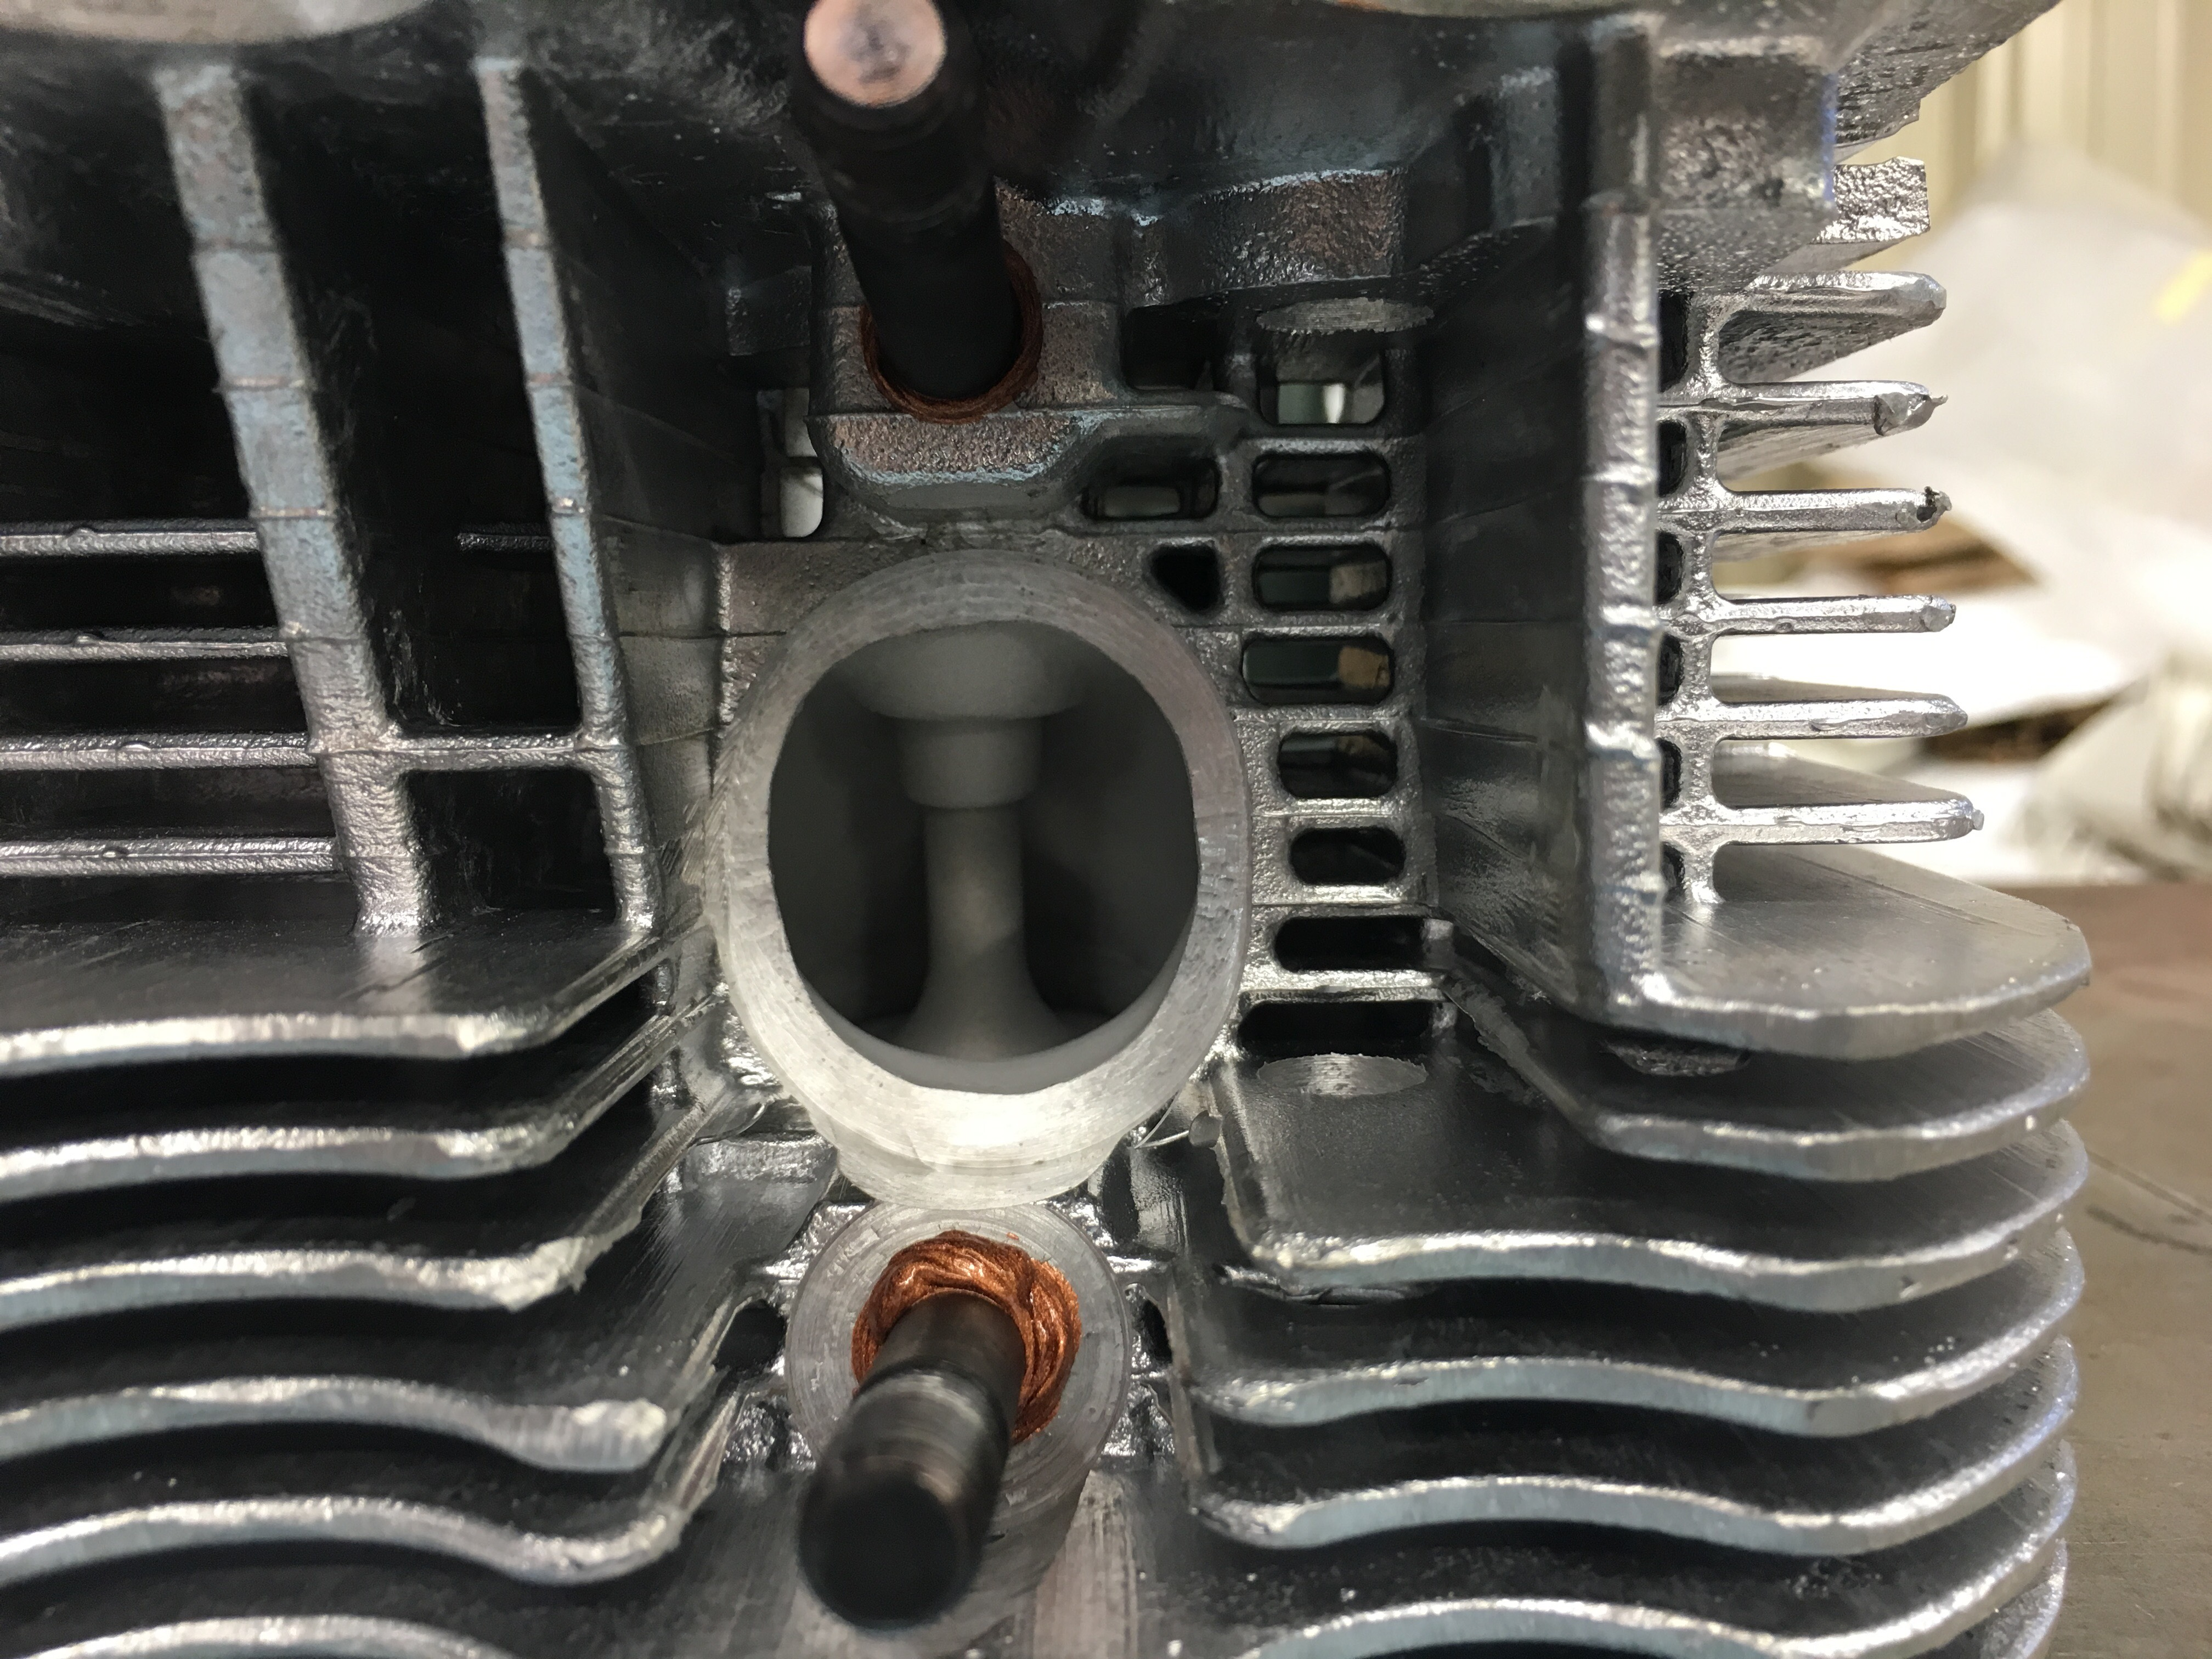 hoffman automotive machine